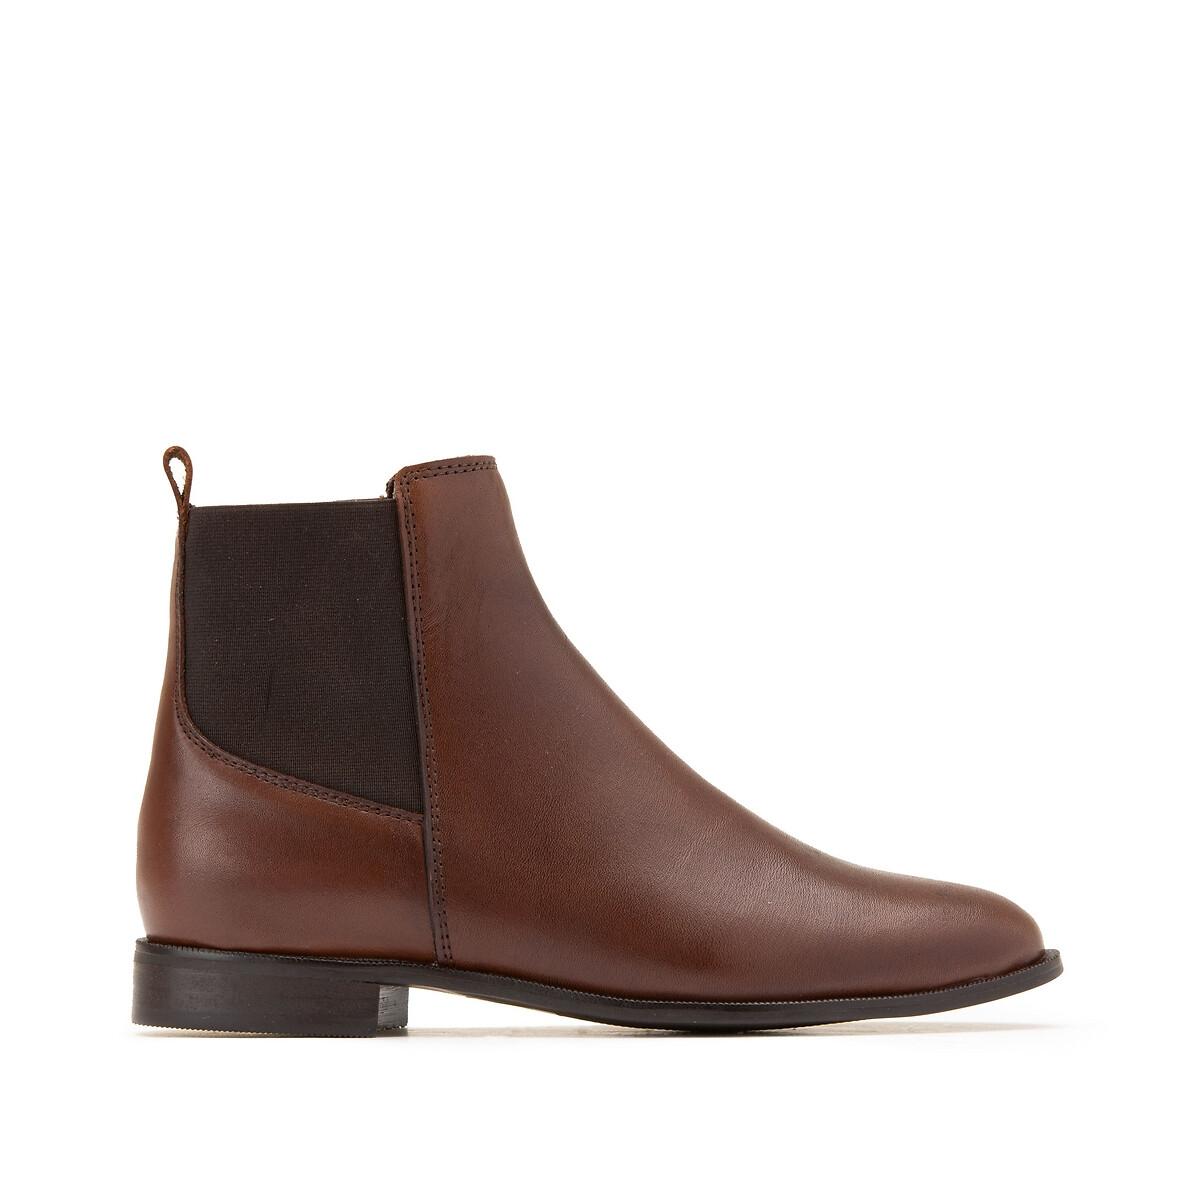 Фото - Ботинки LaRedoute Из кожи на плоском каблуке 42 каштановый сандалии la redoute из кожи с перекрещенными ремешками на плоском каблуке 39 розовый